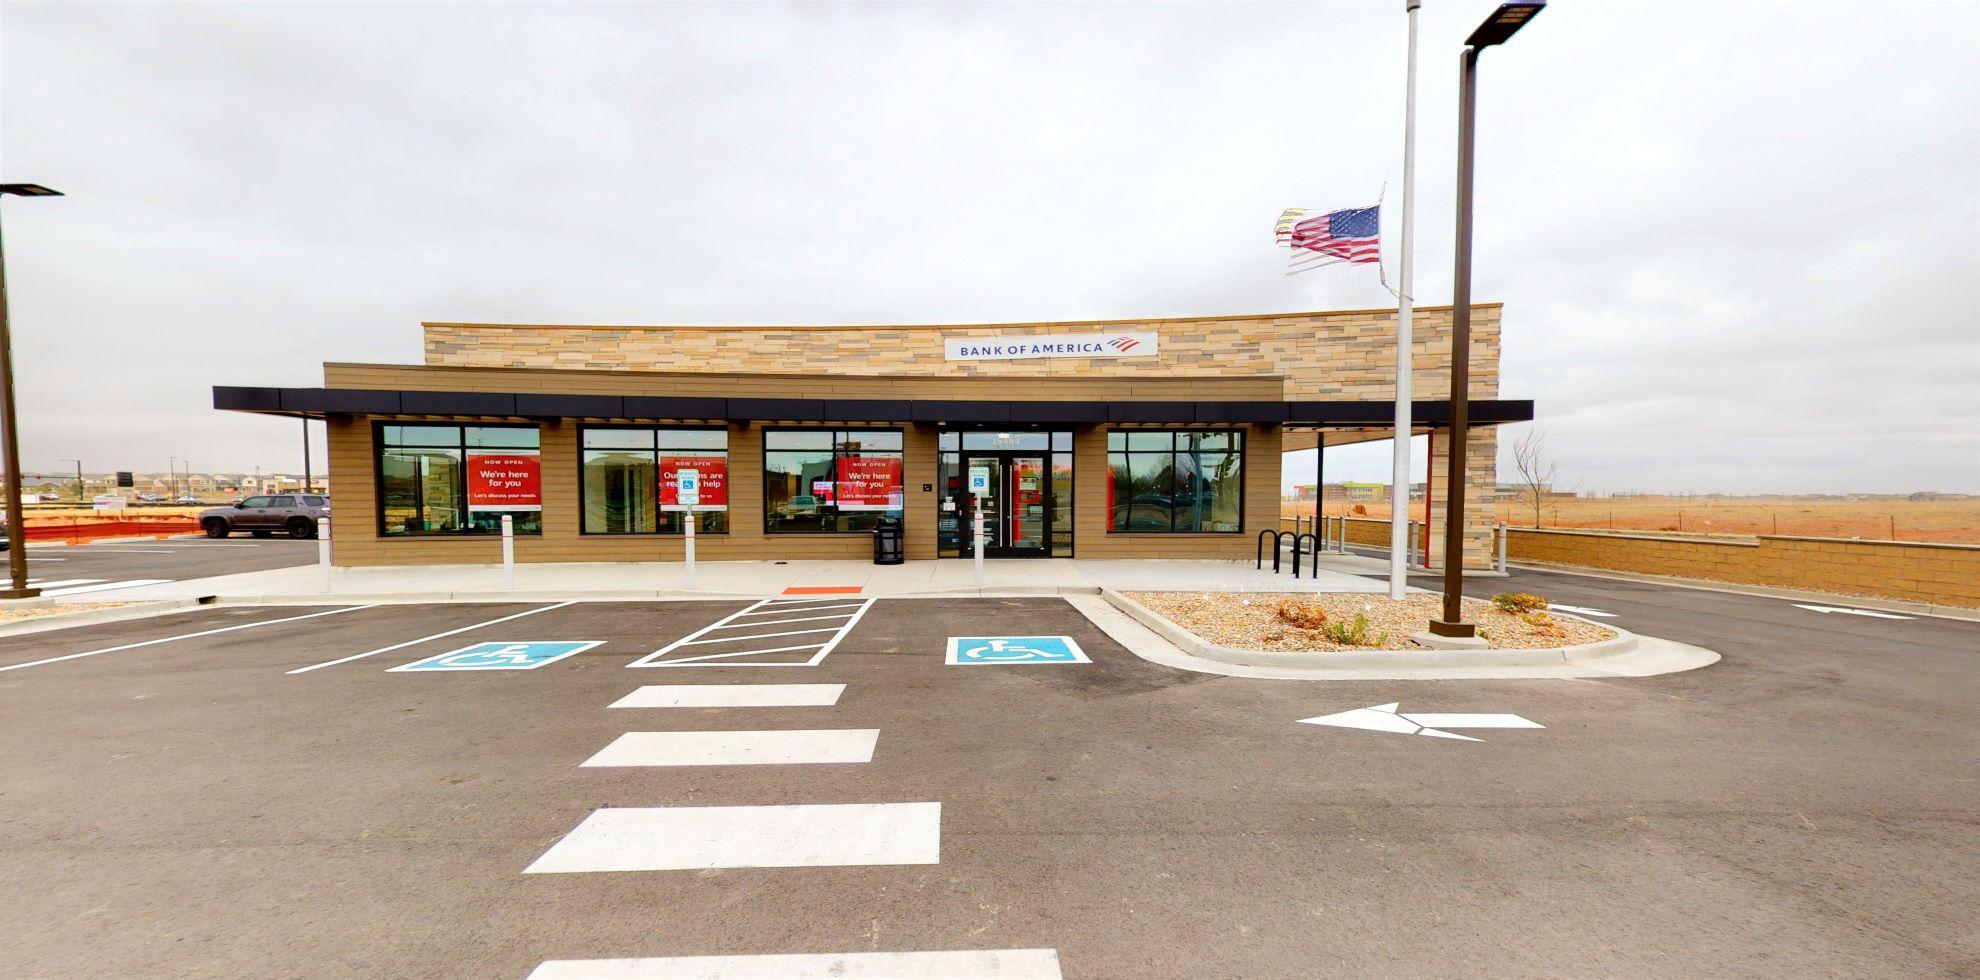 Bank of America financial center with drive-thru ATM   18484 E 49th Ave, Denver, CO 80249